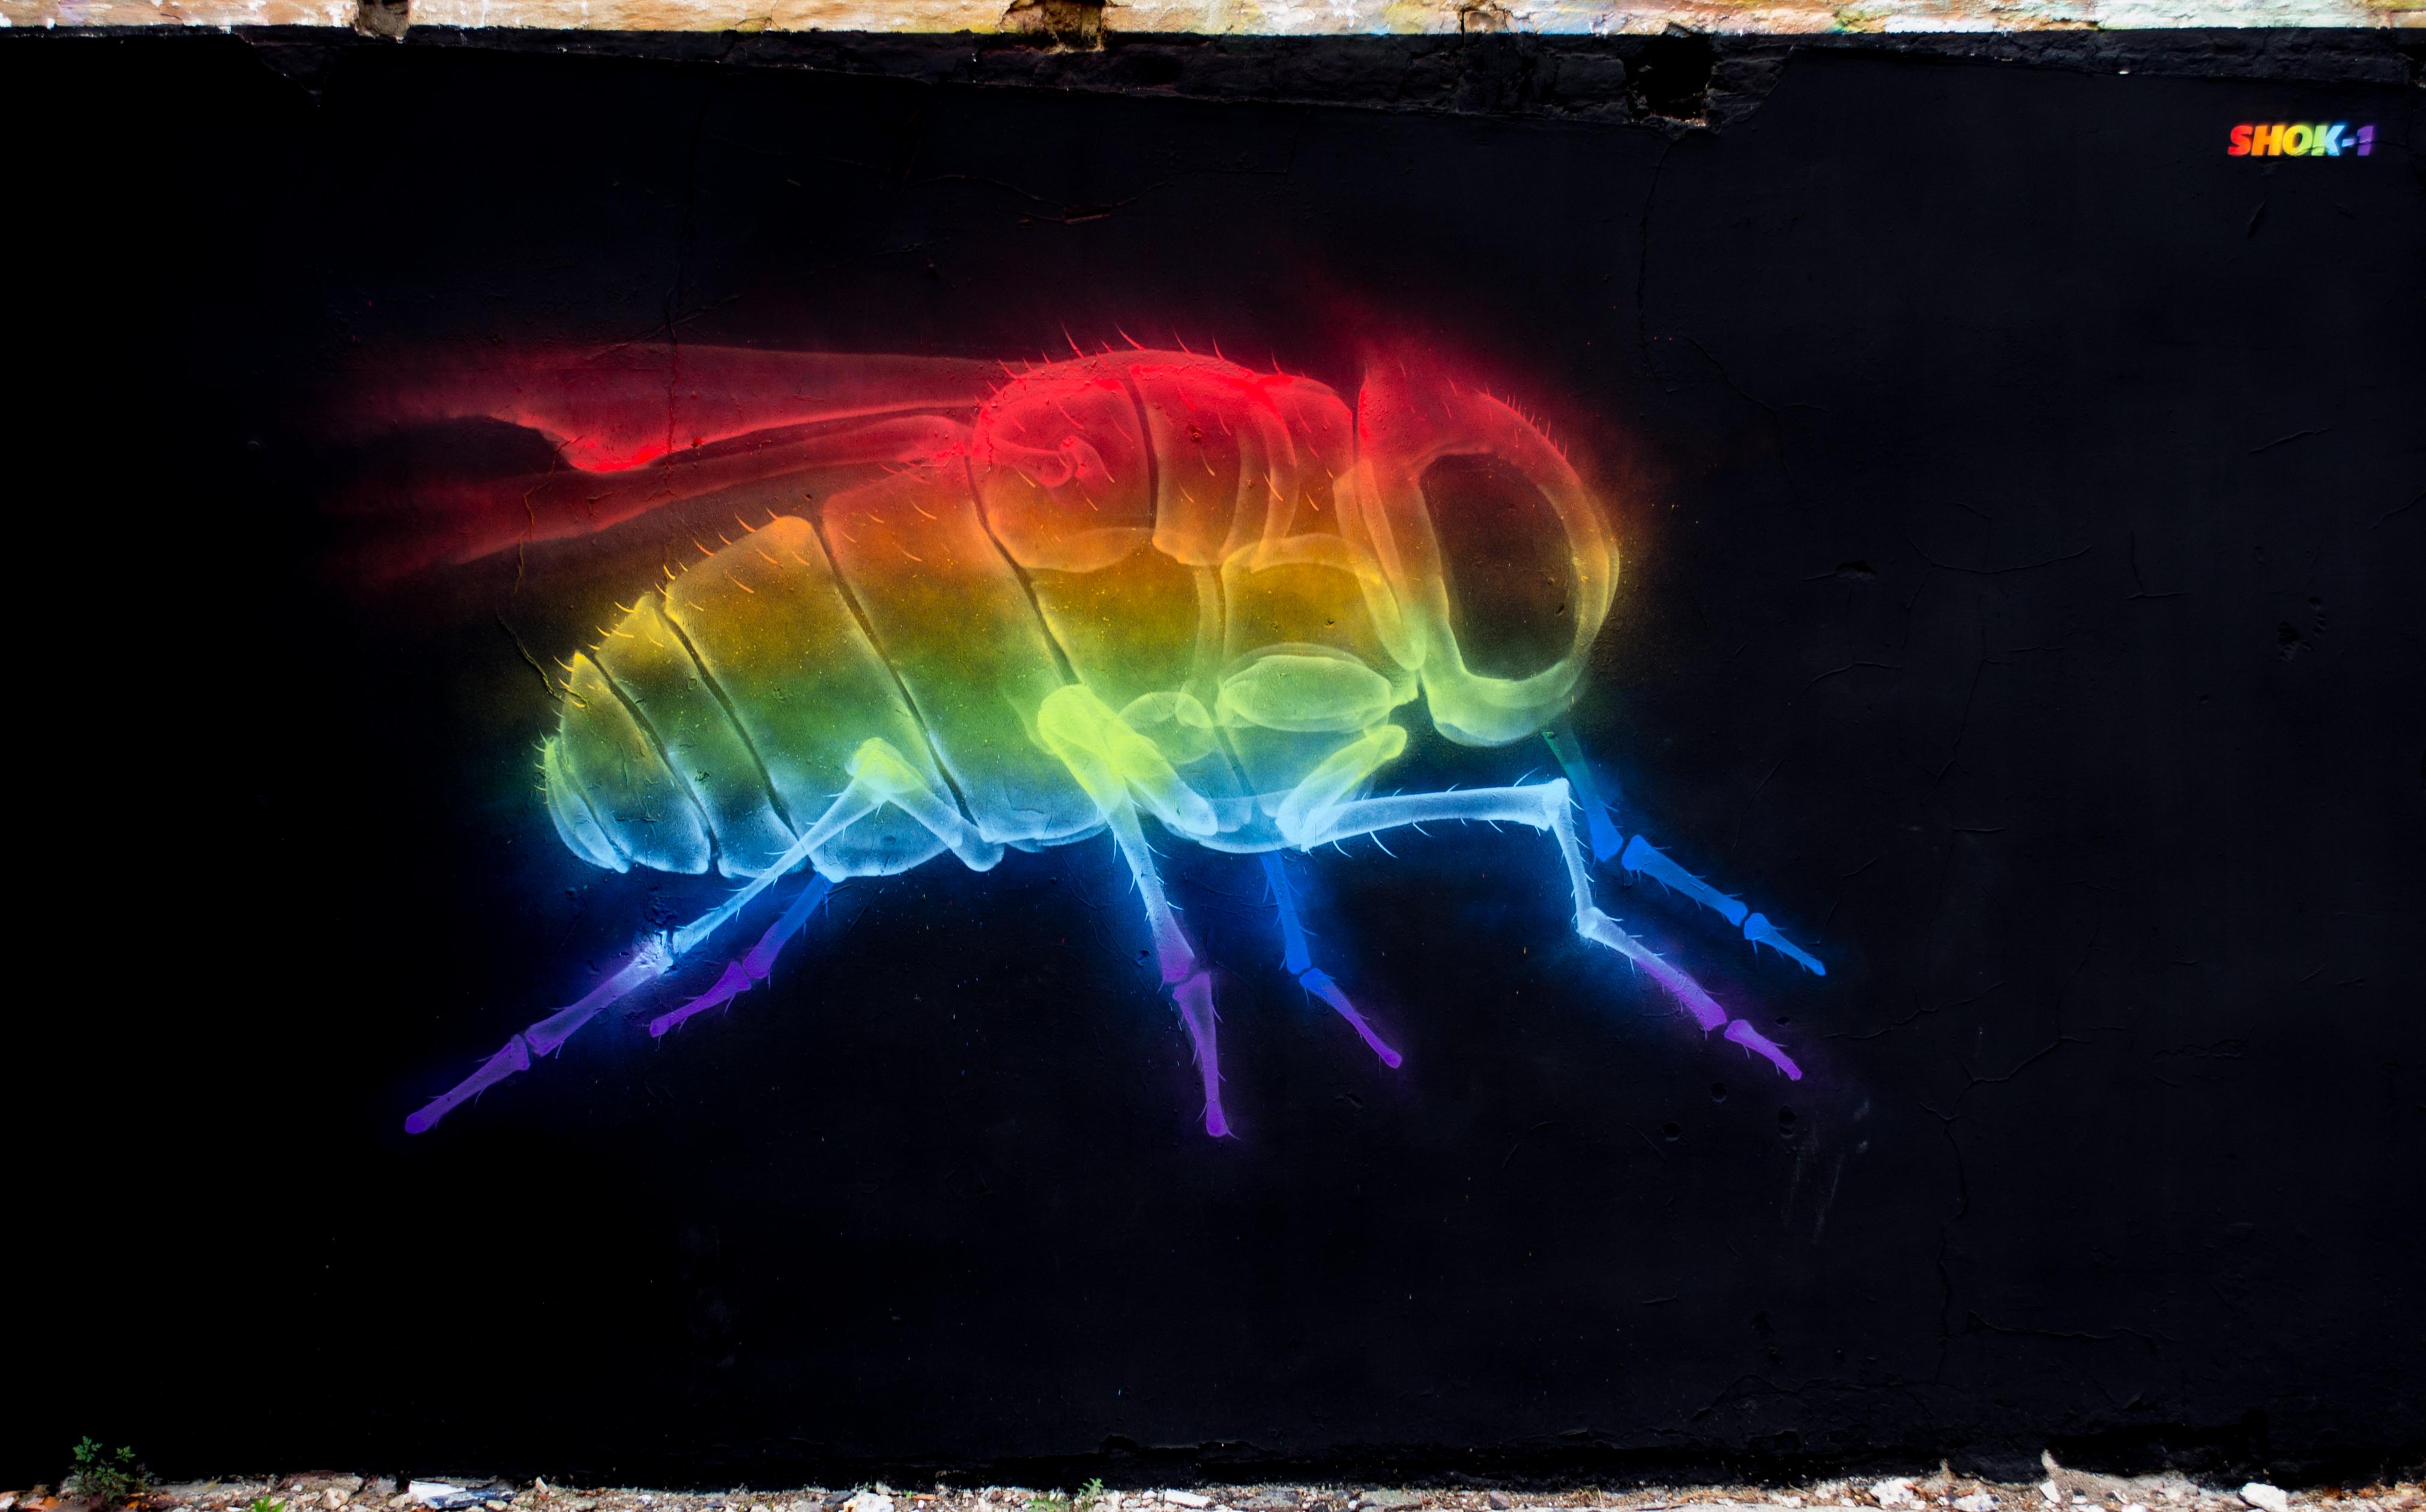 Filegraffiti in shoreditch london rainbow fly by shok1 9444356455 jpg